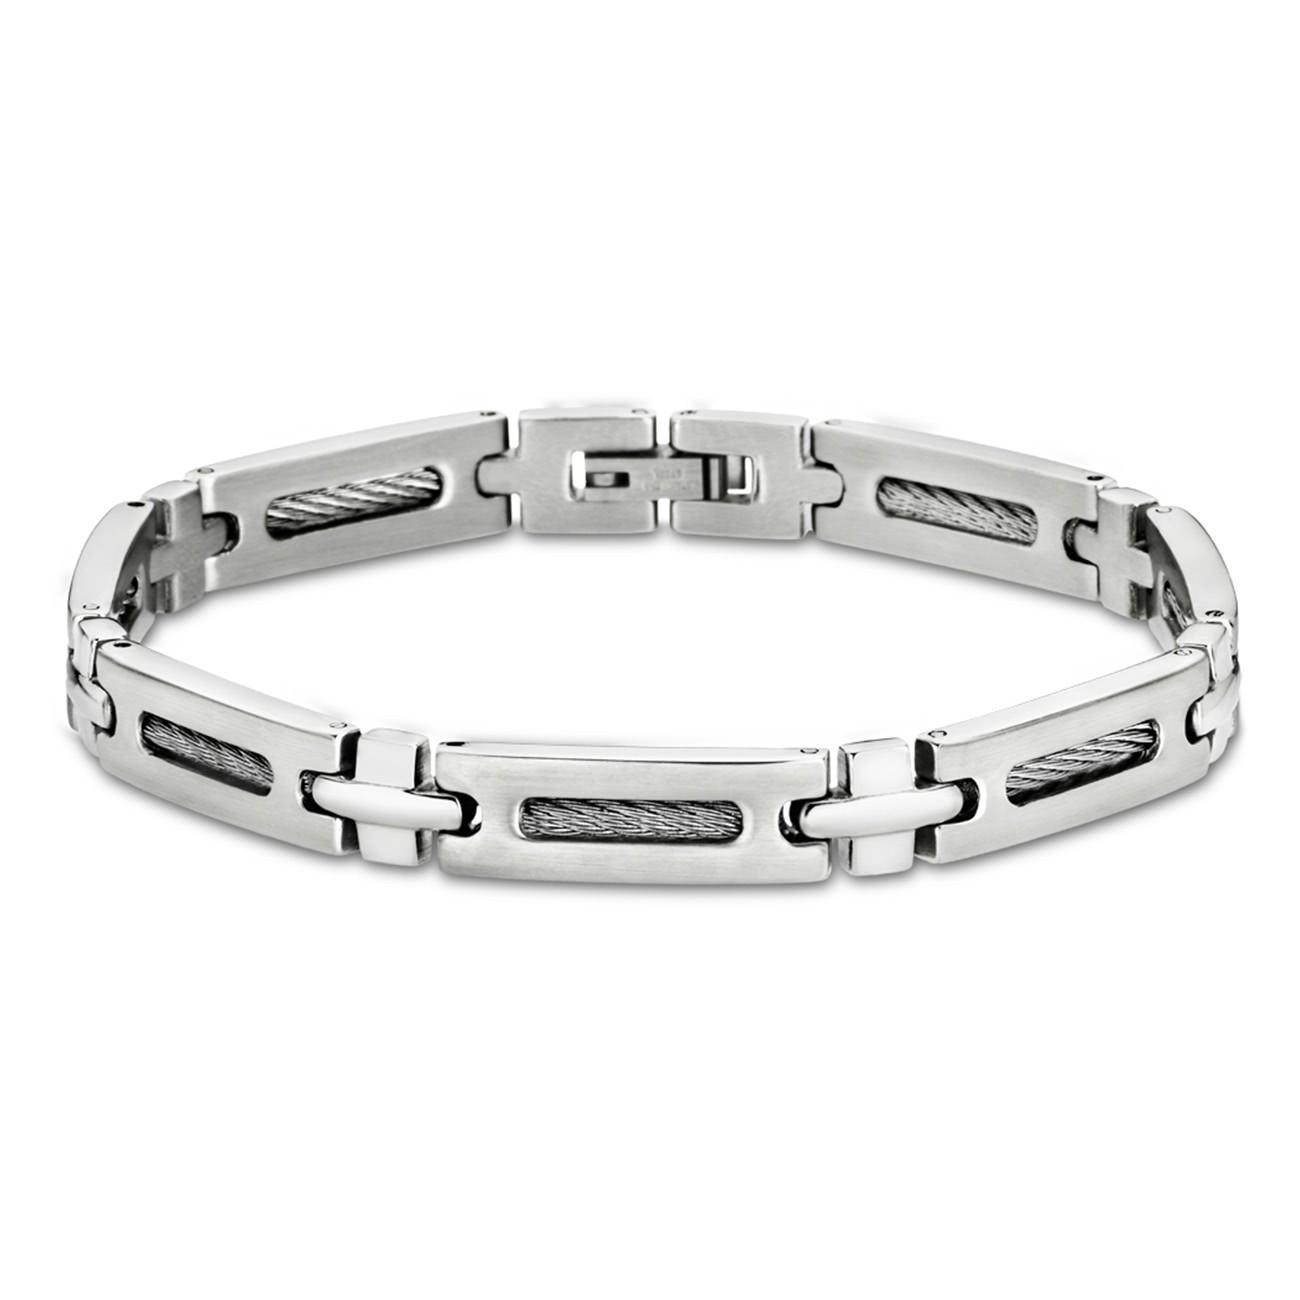 LOTUS Style Armband Herren Edelstahl silber LS1802-2/1 Schmuck JLS1802-2-1